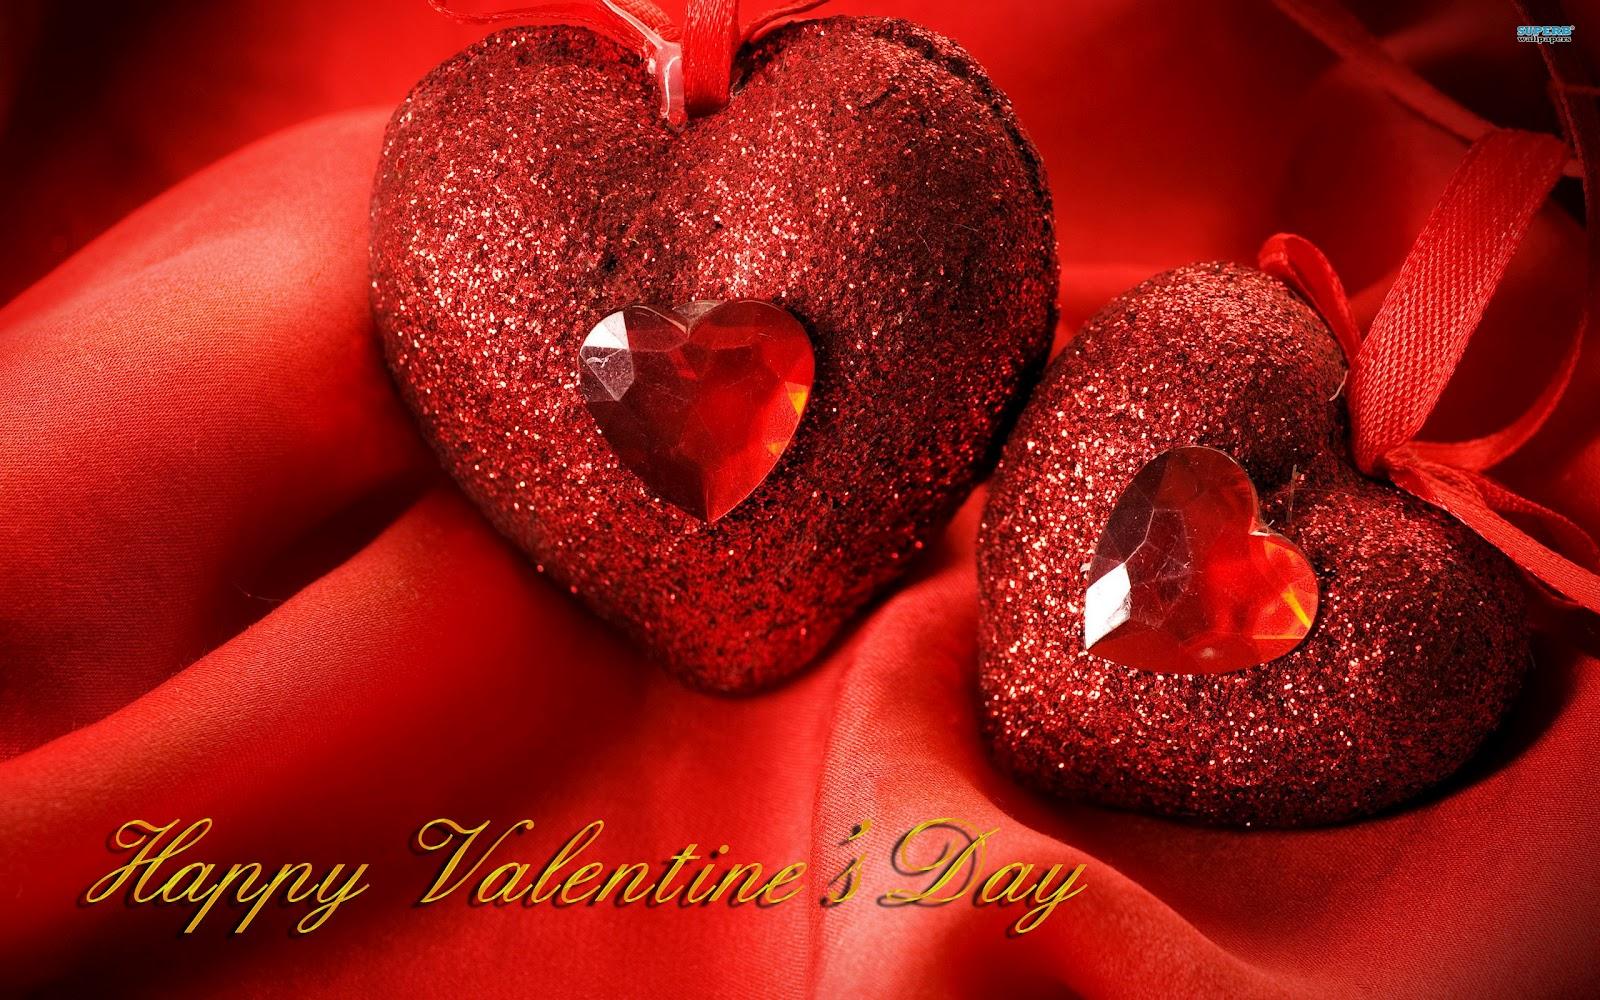 http://4.bp.blogspot.com/-00uMpjw56gg/ULGf9_DPGMI/AAAAAAAARbA/CdILtPSgN-w/s1600/valentines-day-10960-2560x1600.jpg